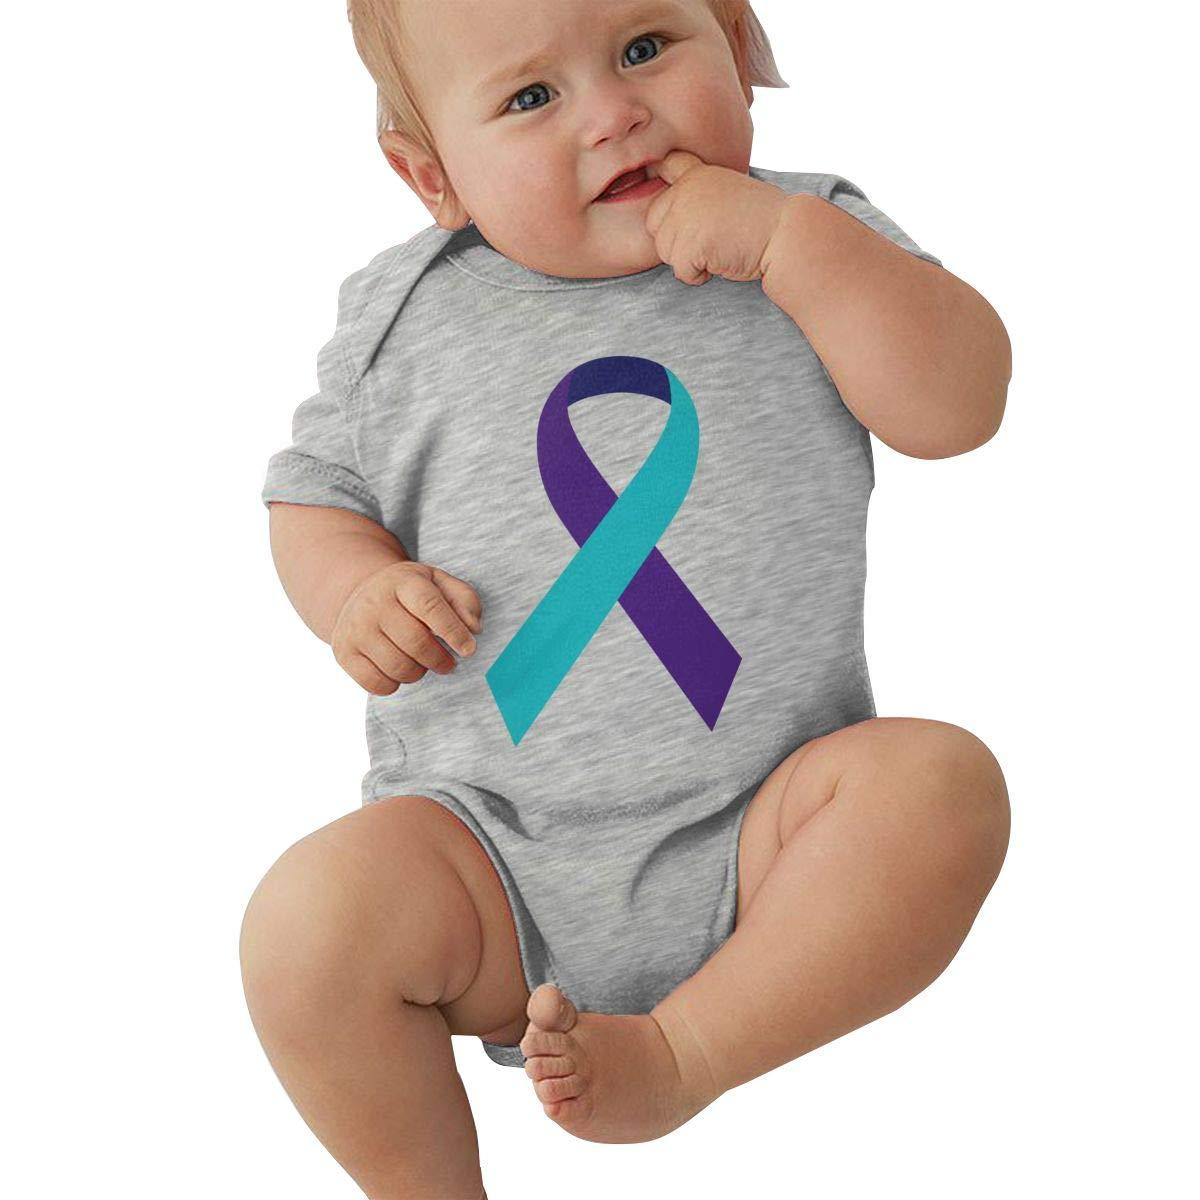 Infant Baby Girl Boy Suicide Prevention Awareness Ribbon BodysuitRomper Jumpsuit Short Sleeved Bodysuit Tops Clothes